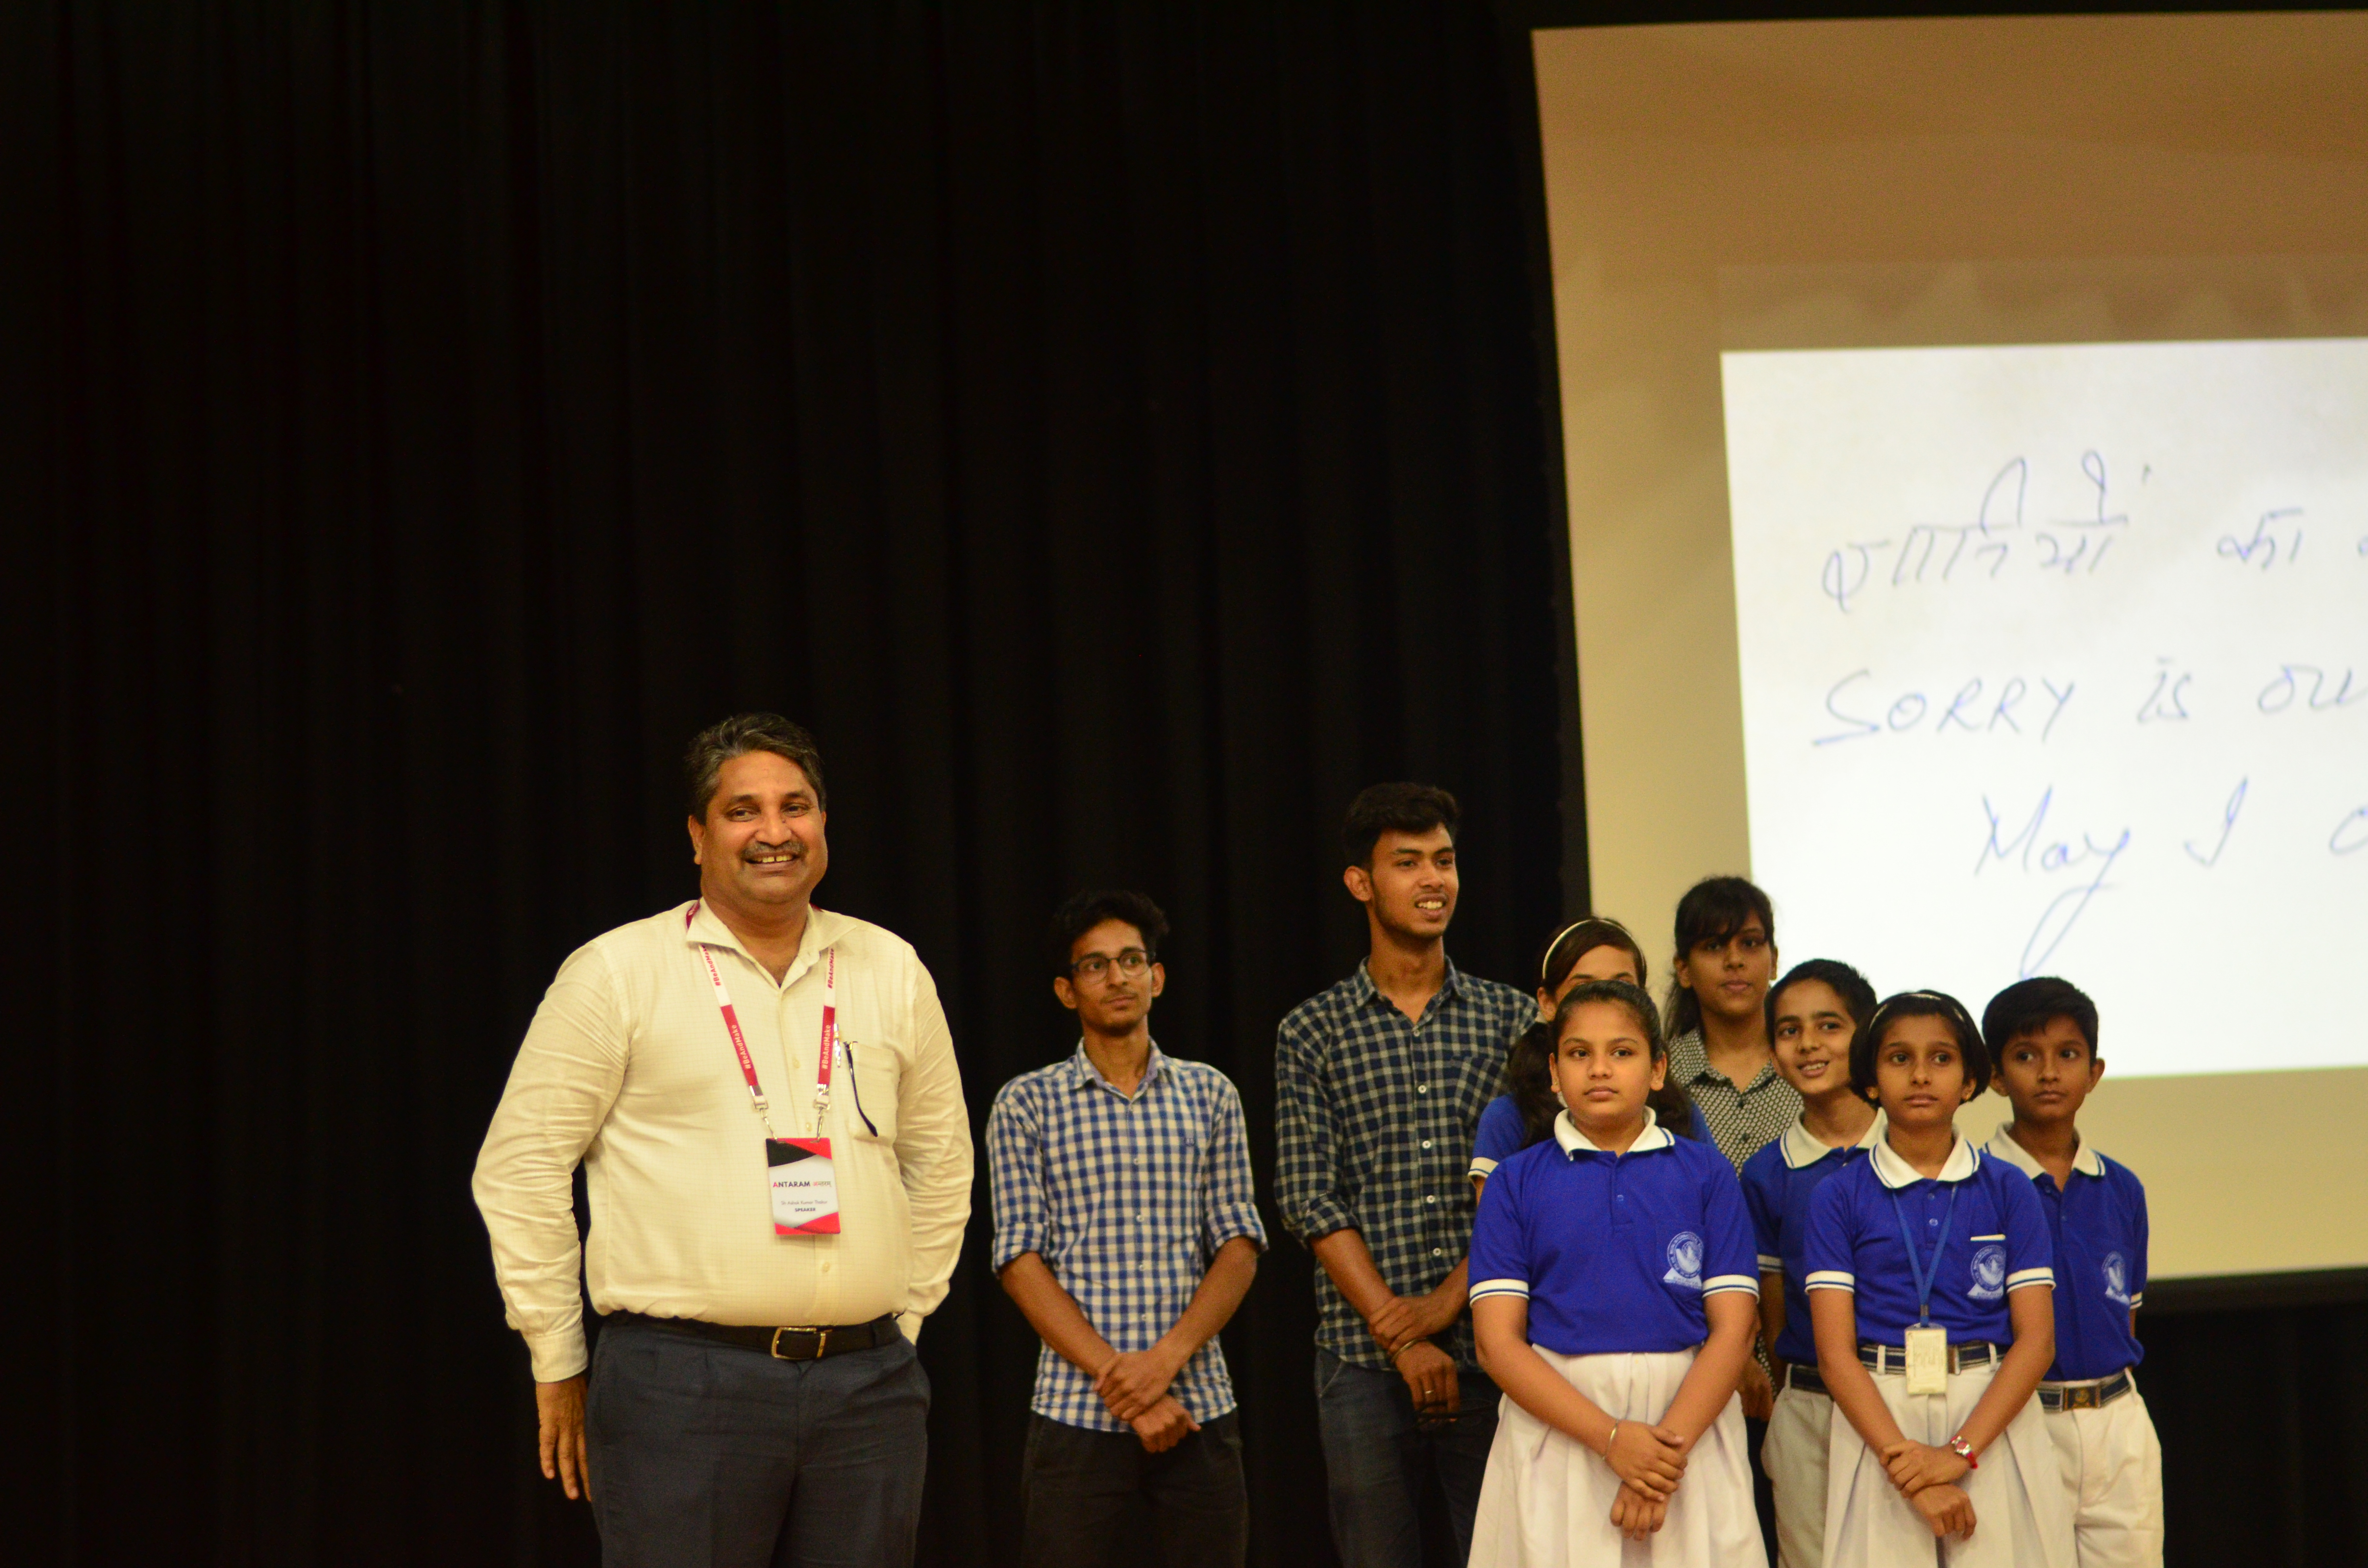 Honored as a distinguished speaker at Antaram